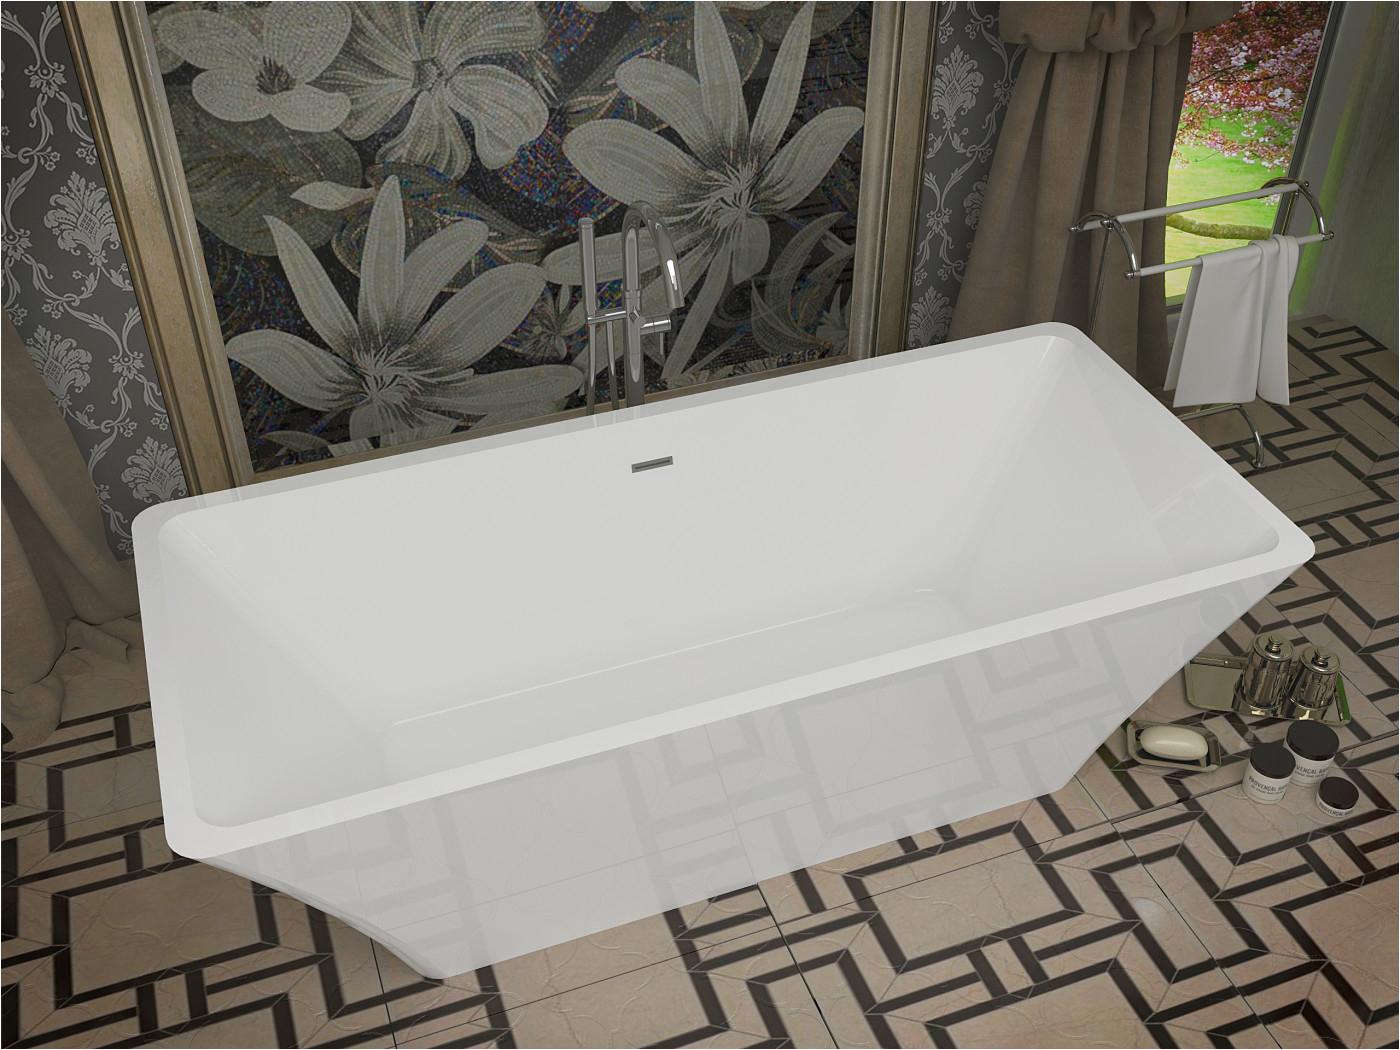 arden 5 5 ft acrylic center drain freestanding bathtub in glossy white